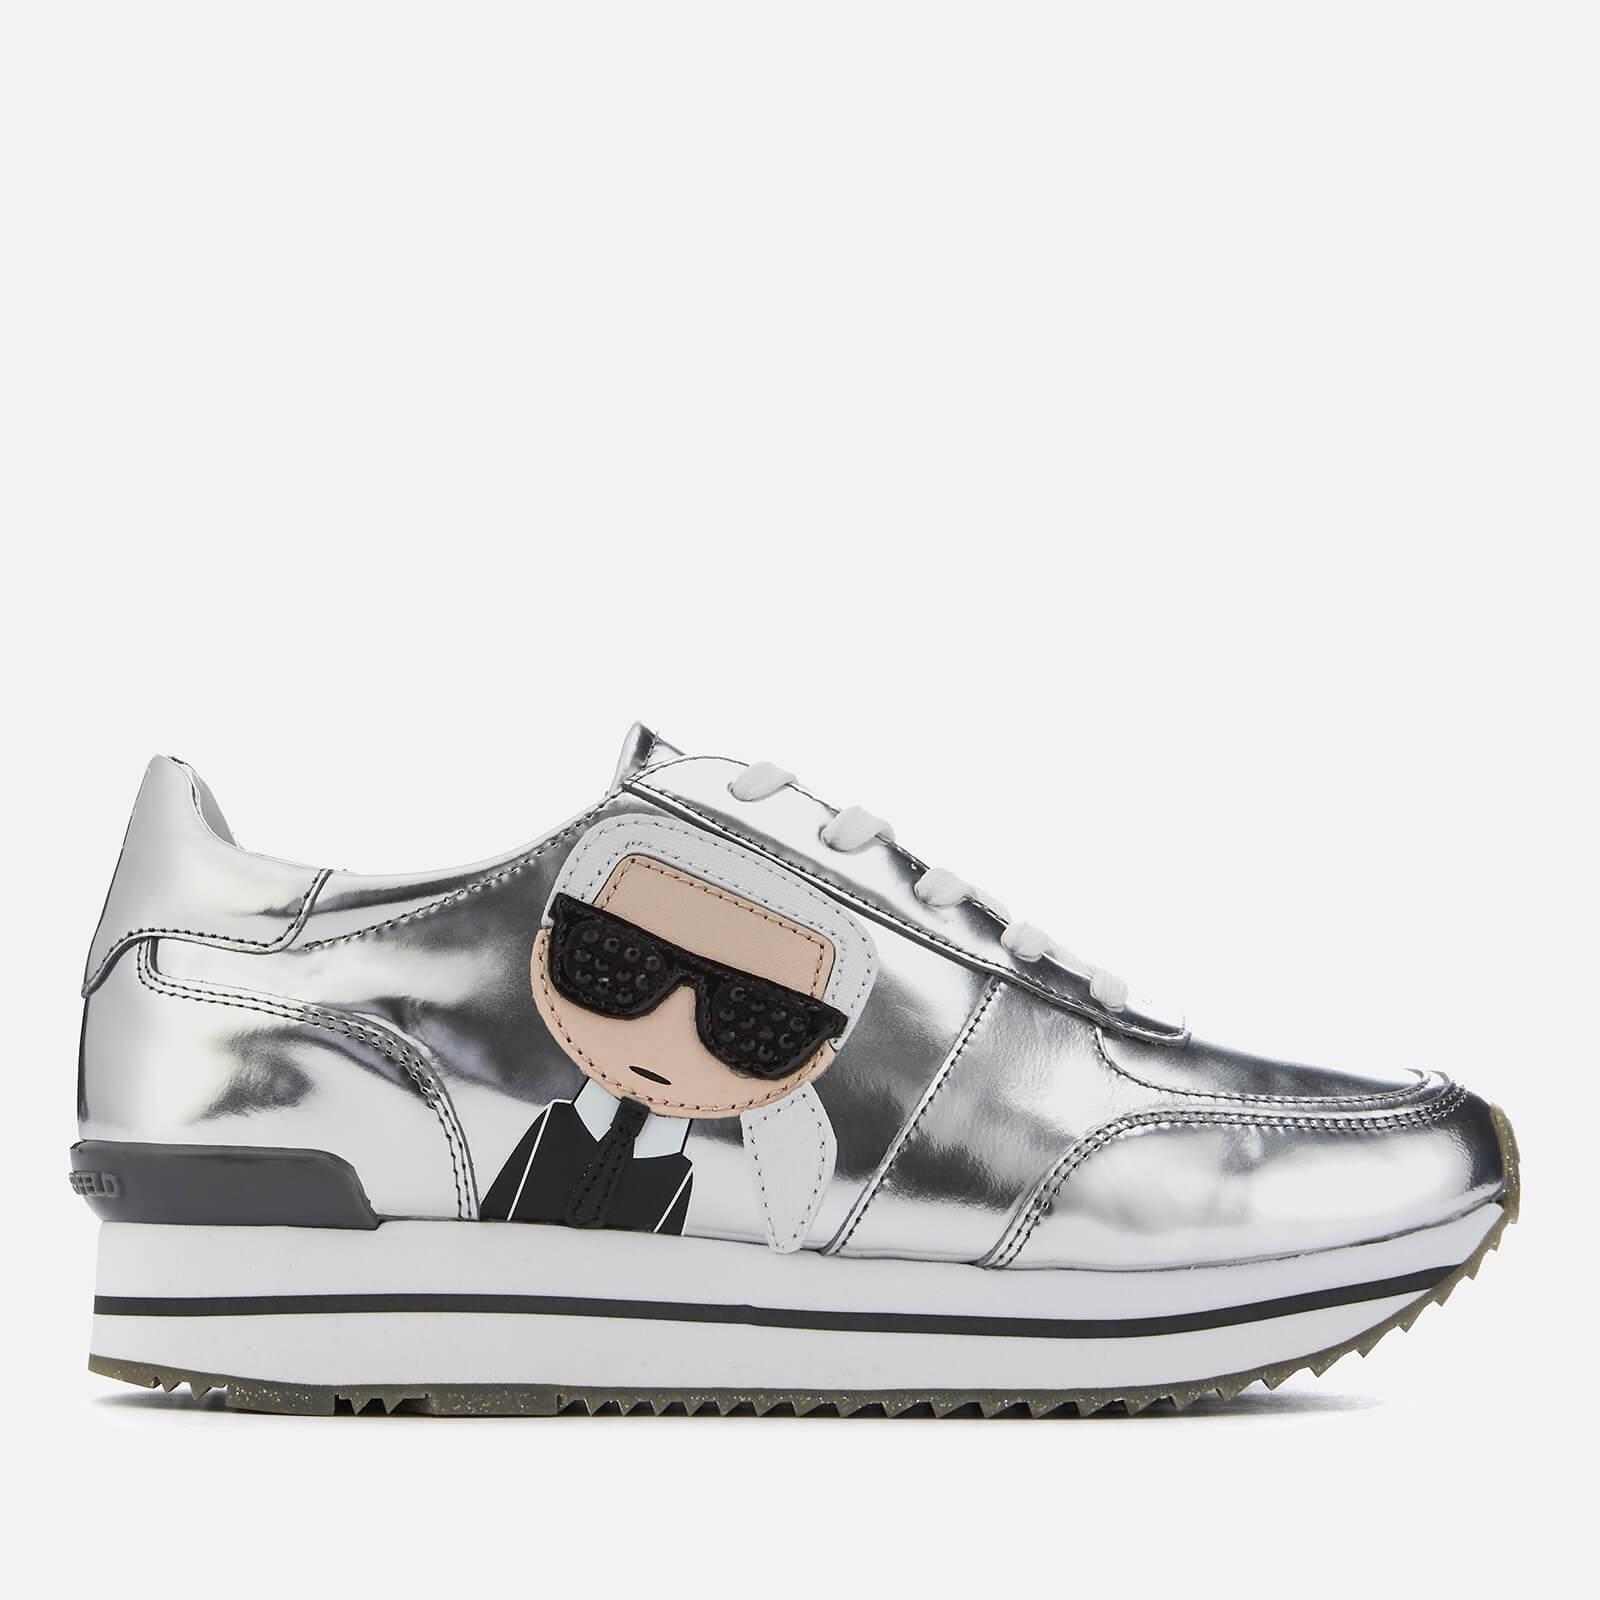 25275b42c300 Karl Lagerfeld Women s Velocita II Leather Karl Ikonic Meteor Lace Runner  Trainers - Dark Silver Mirror Womens Footwear